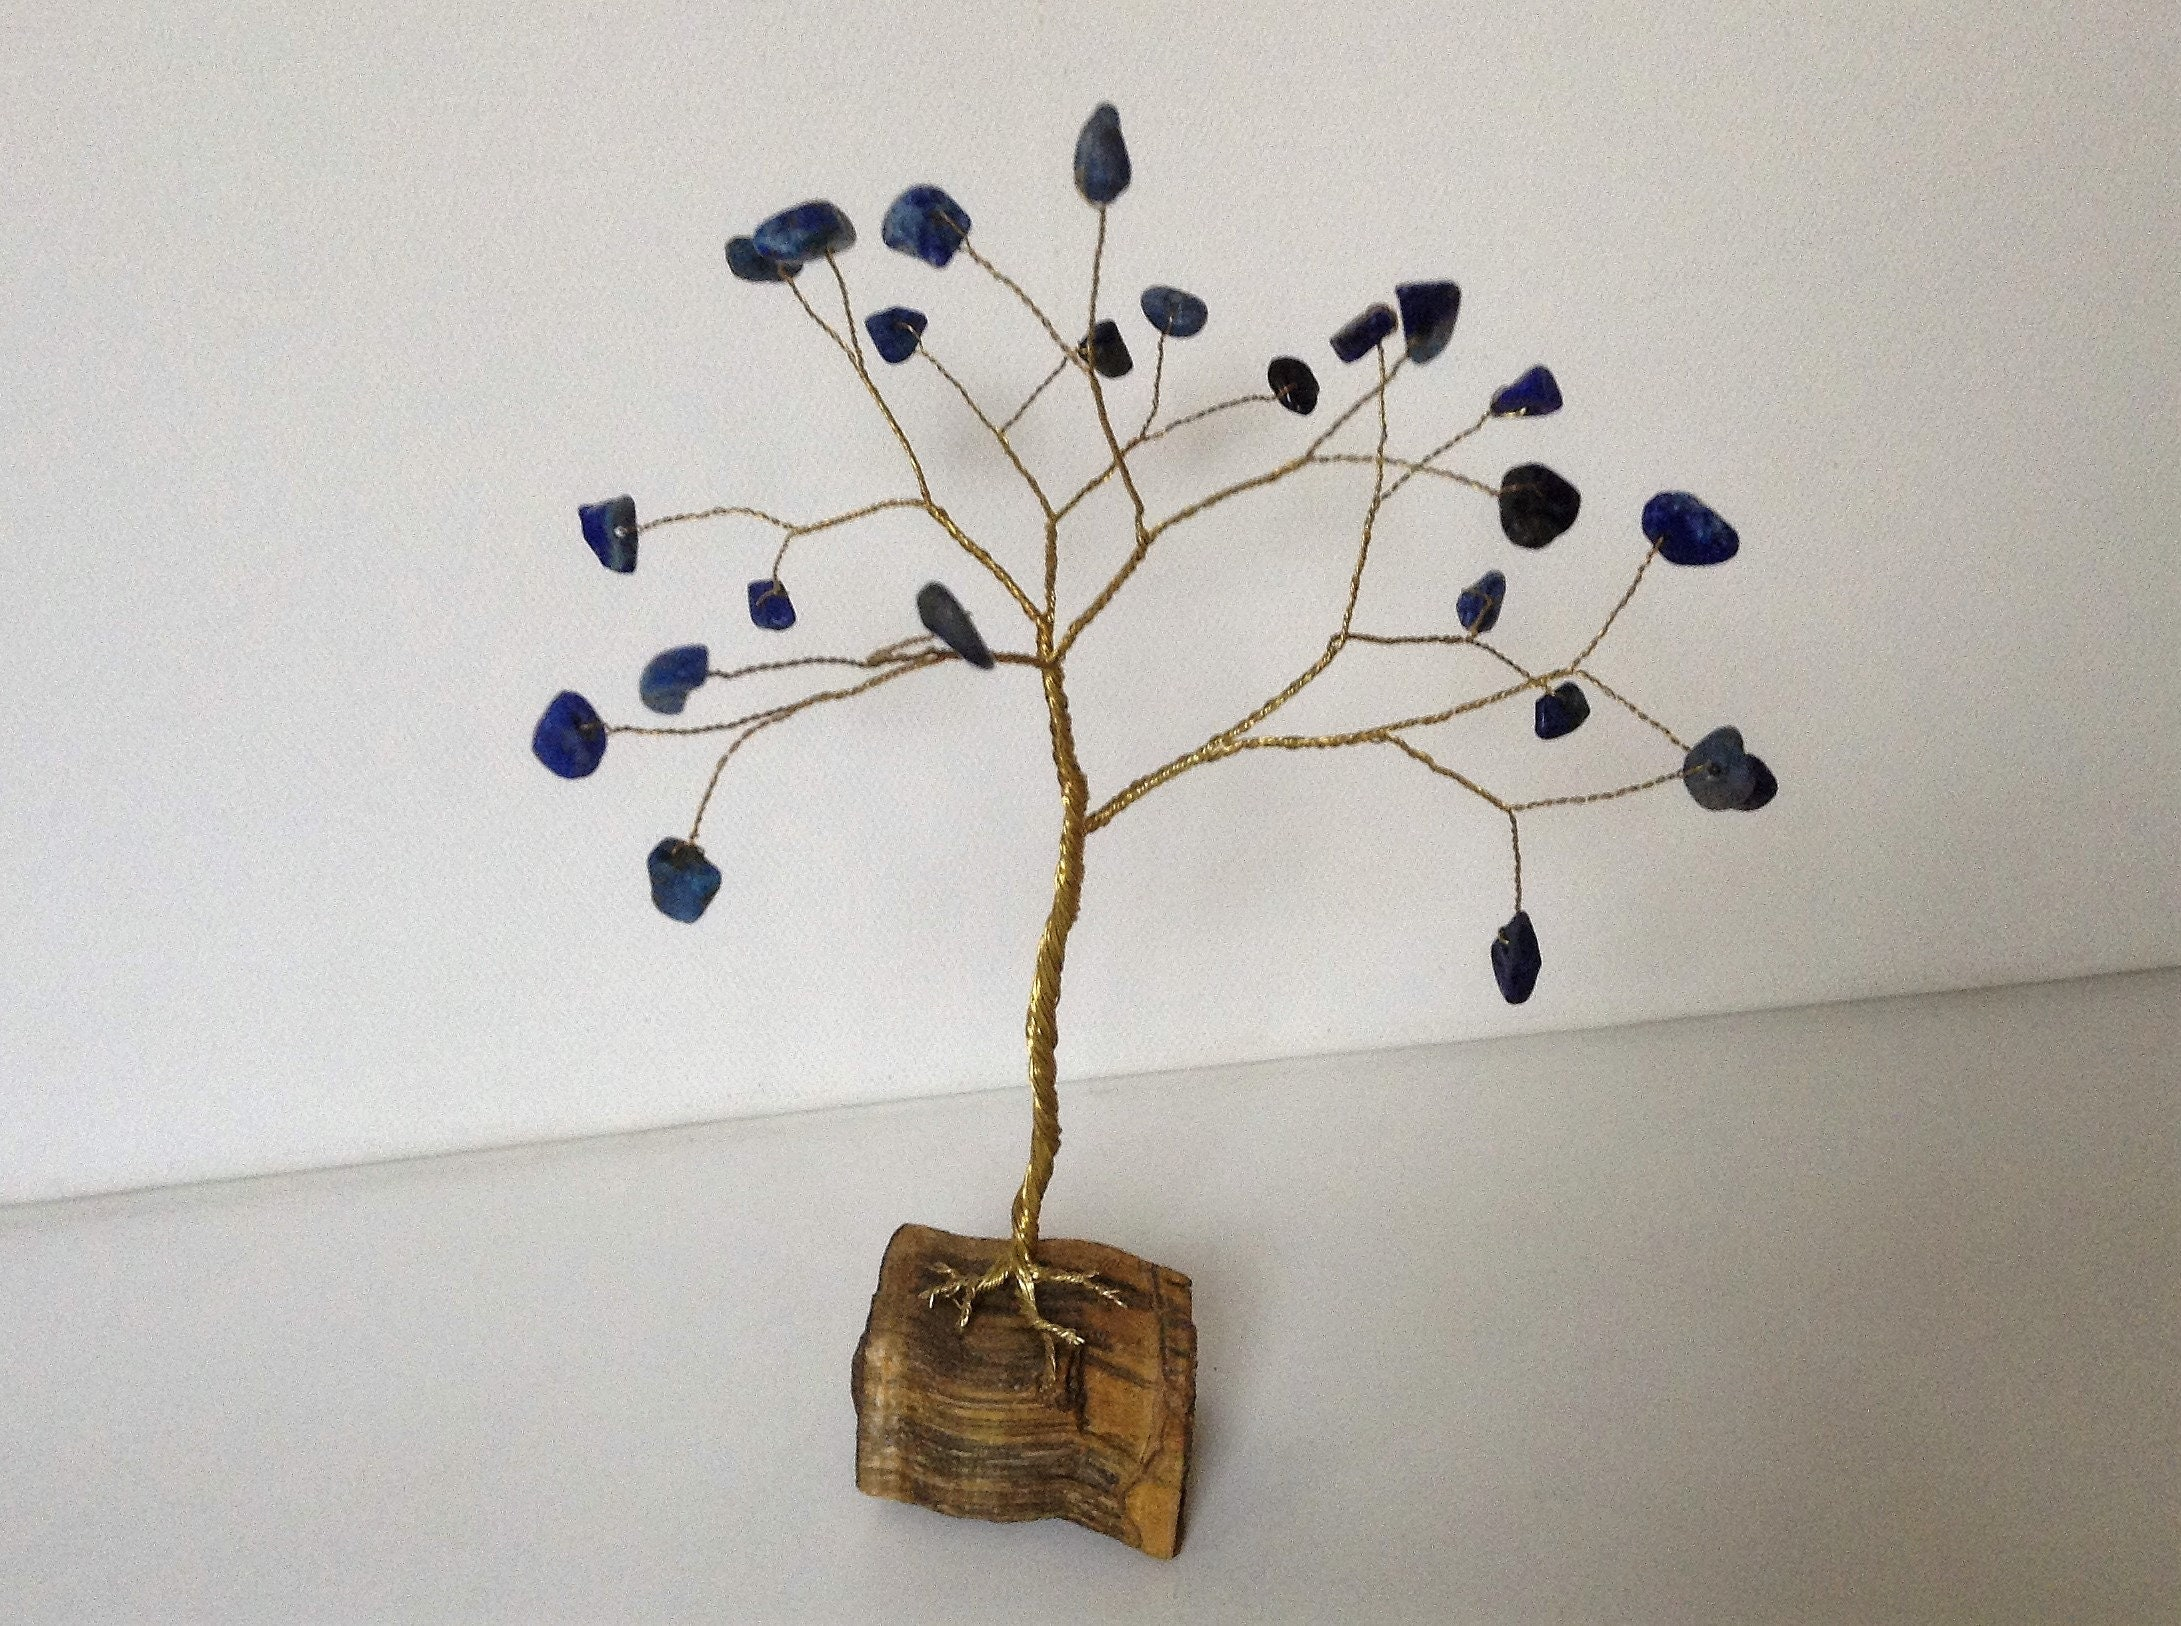 Lapislazuli Edelstein Baum. Draht Baum Skulptur mit Lapis